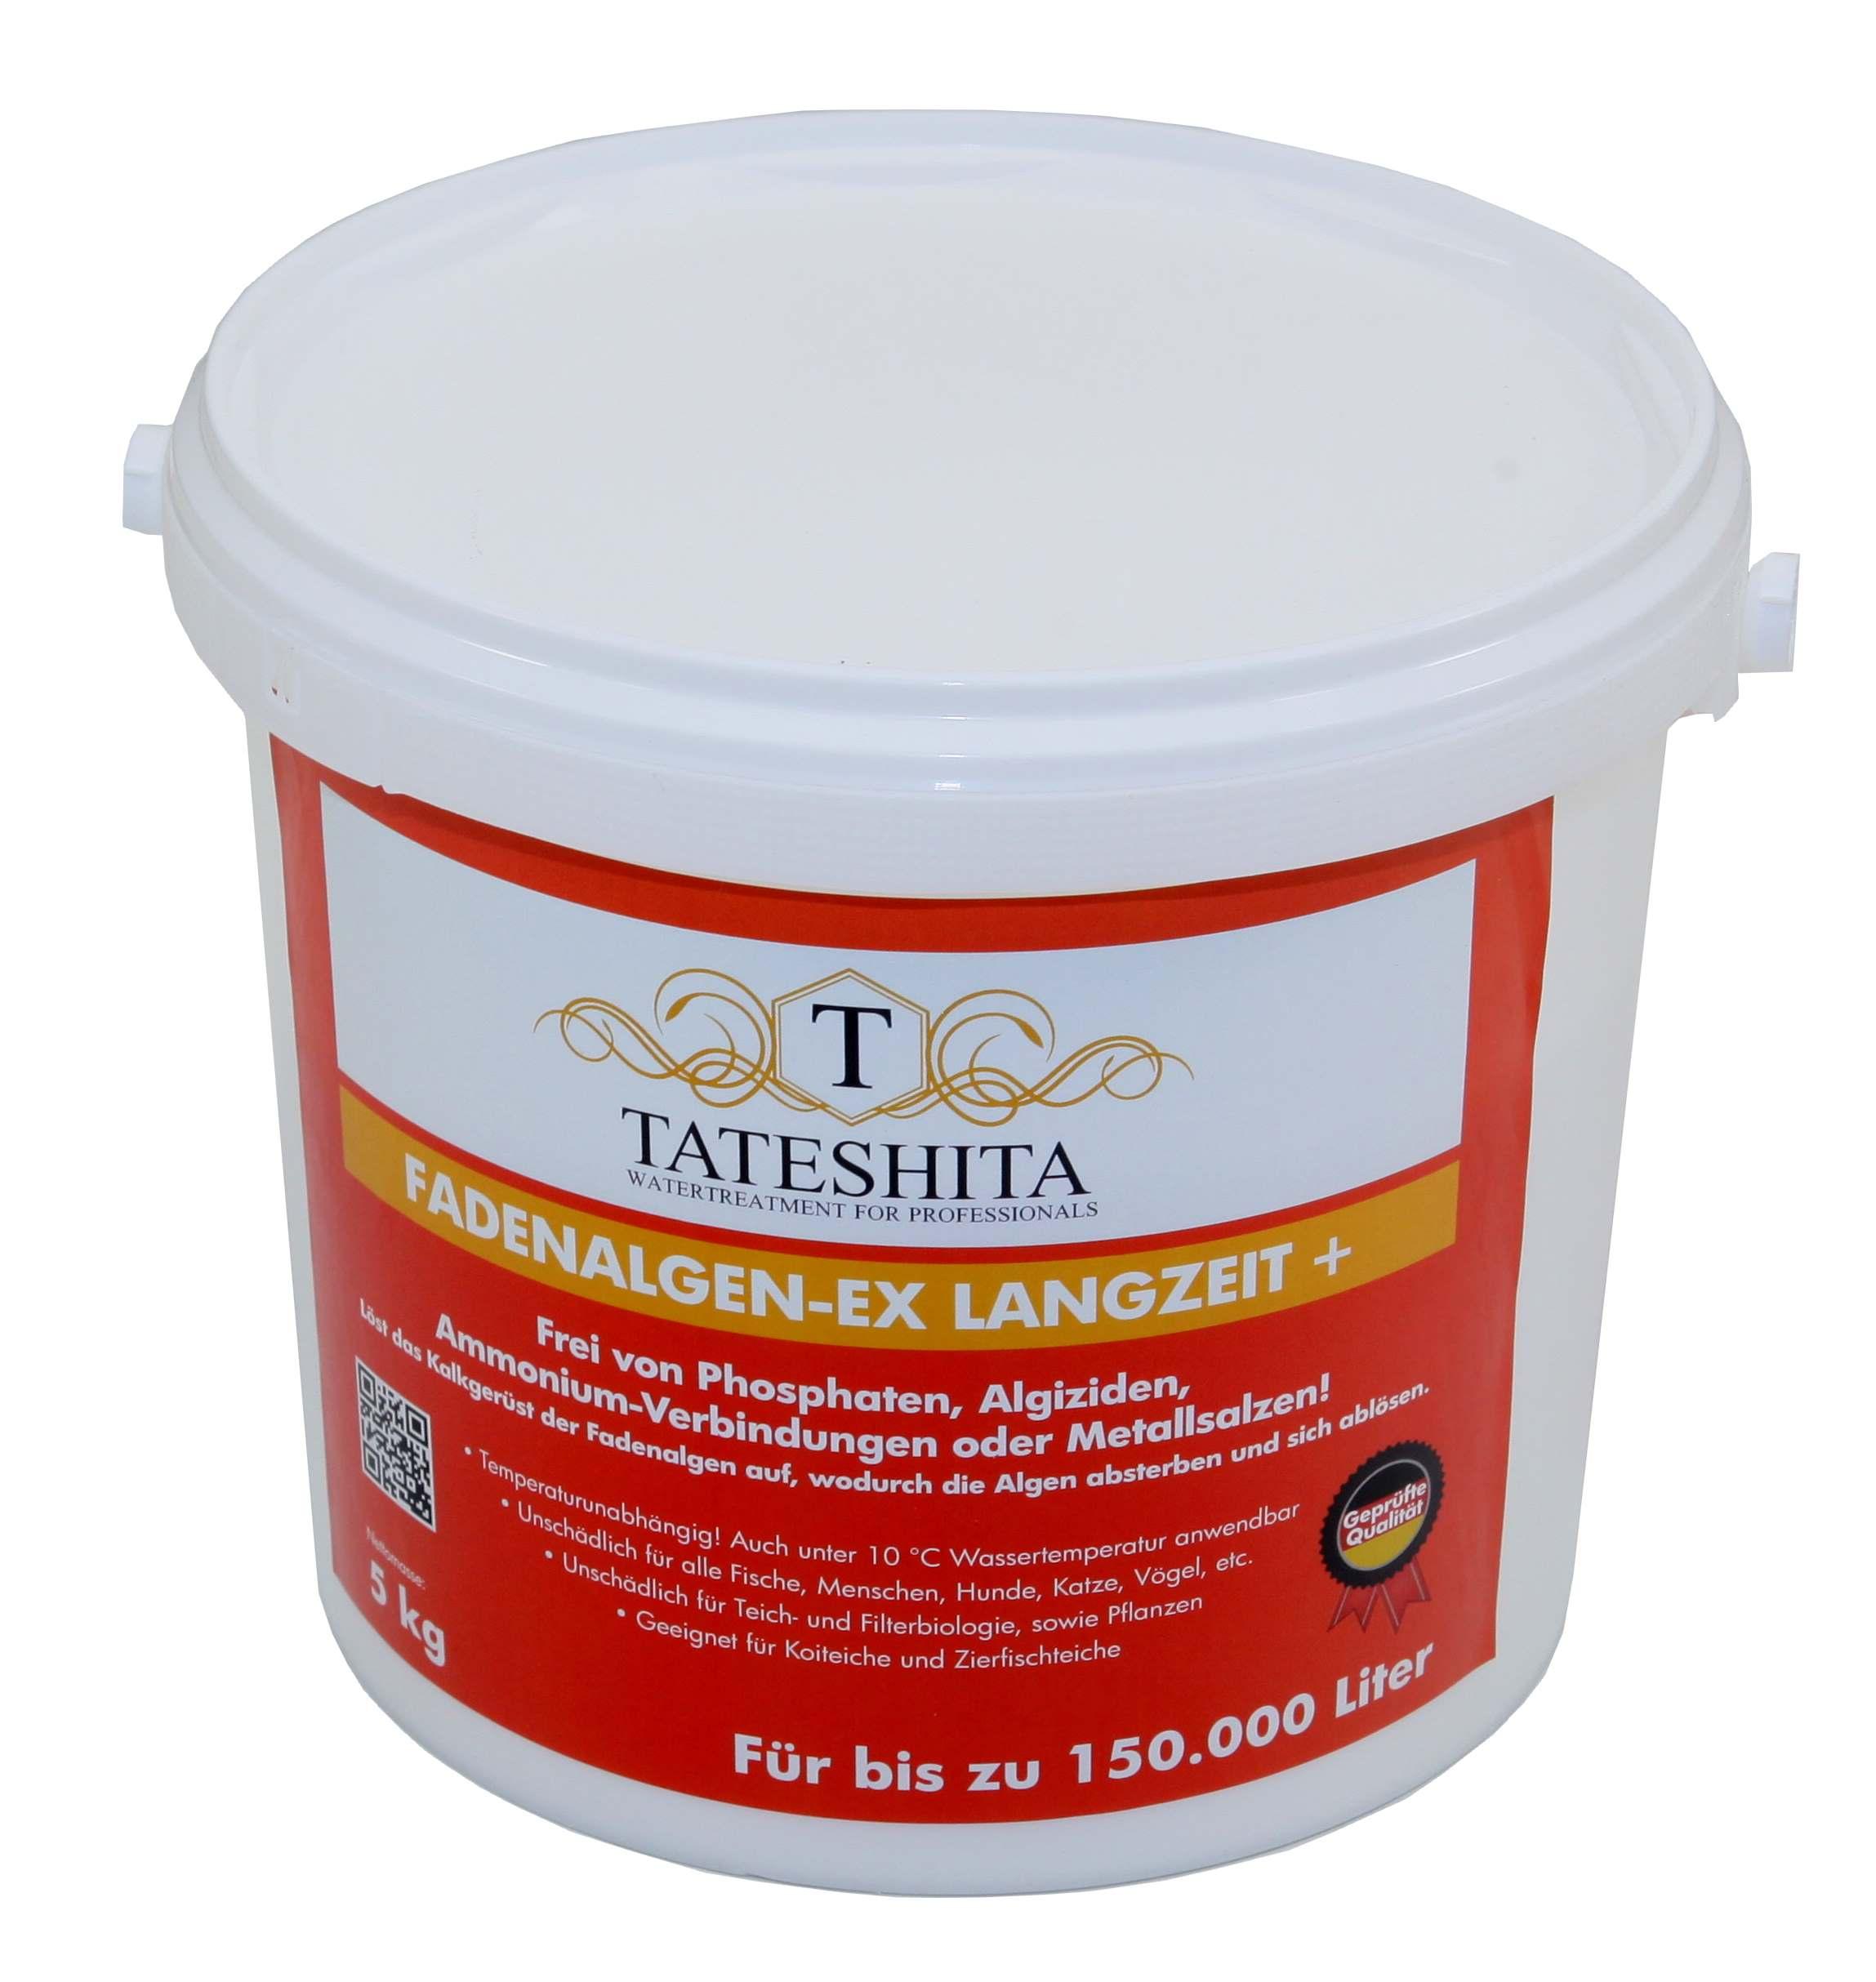 Tateshita Fadenalgen-EX LANGZEIT + 5 kg